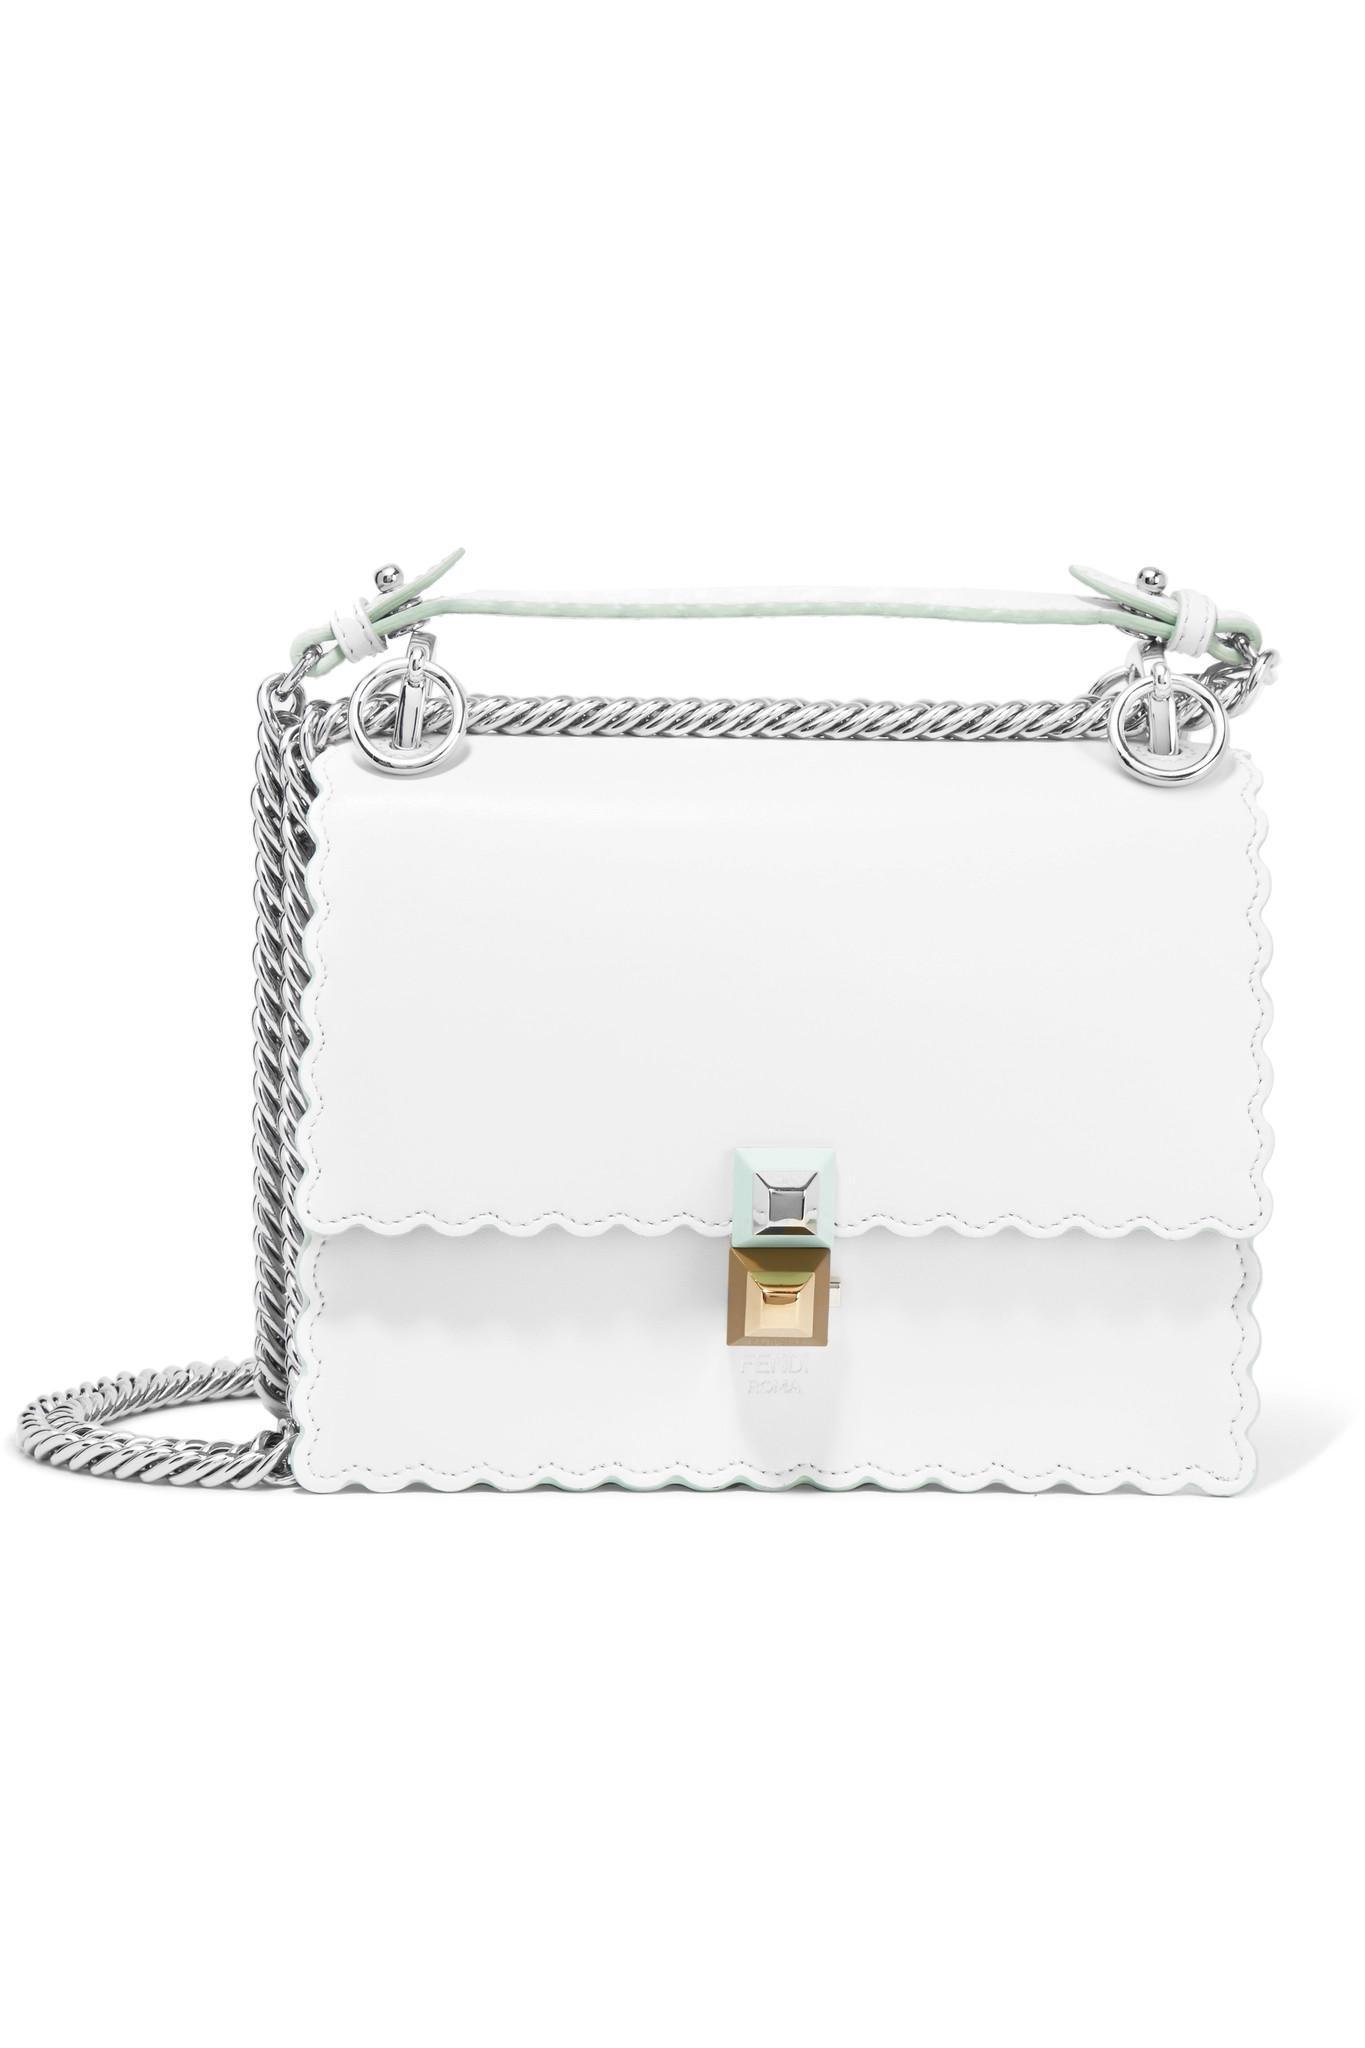 Lyst - Fendi Kan I Mini Leather Shoulder Bag in White 2b115eb650119